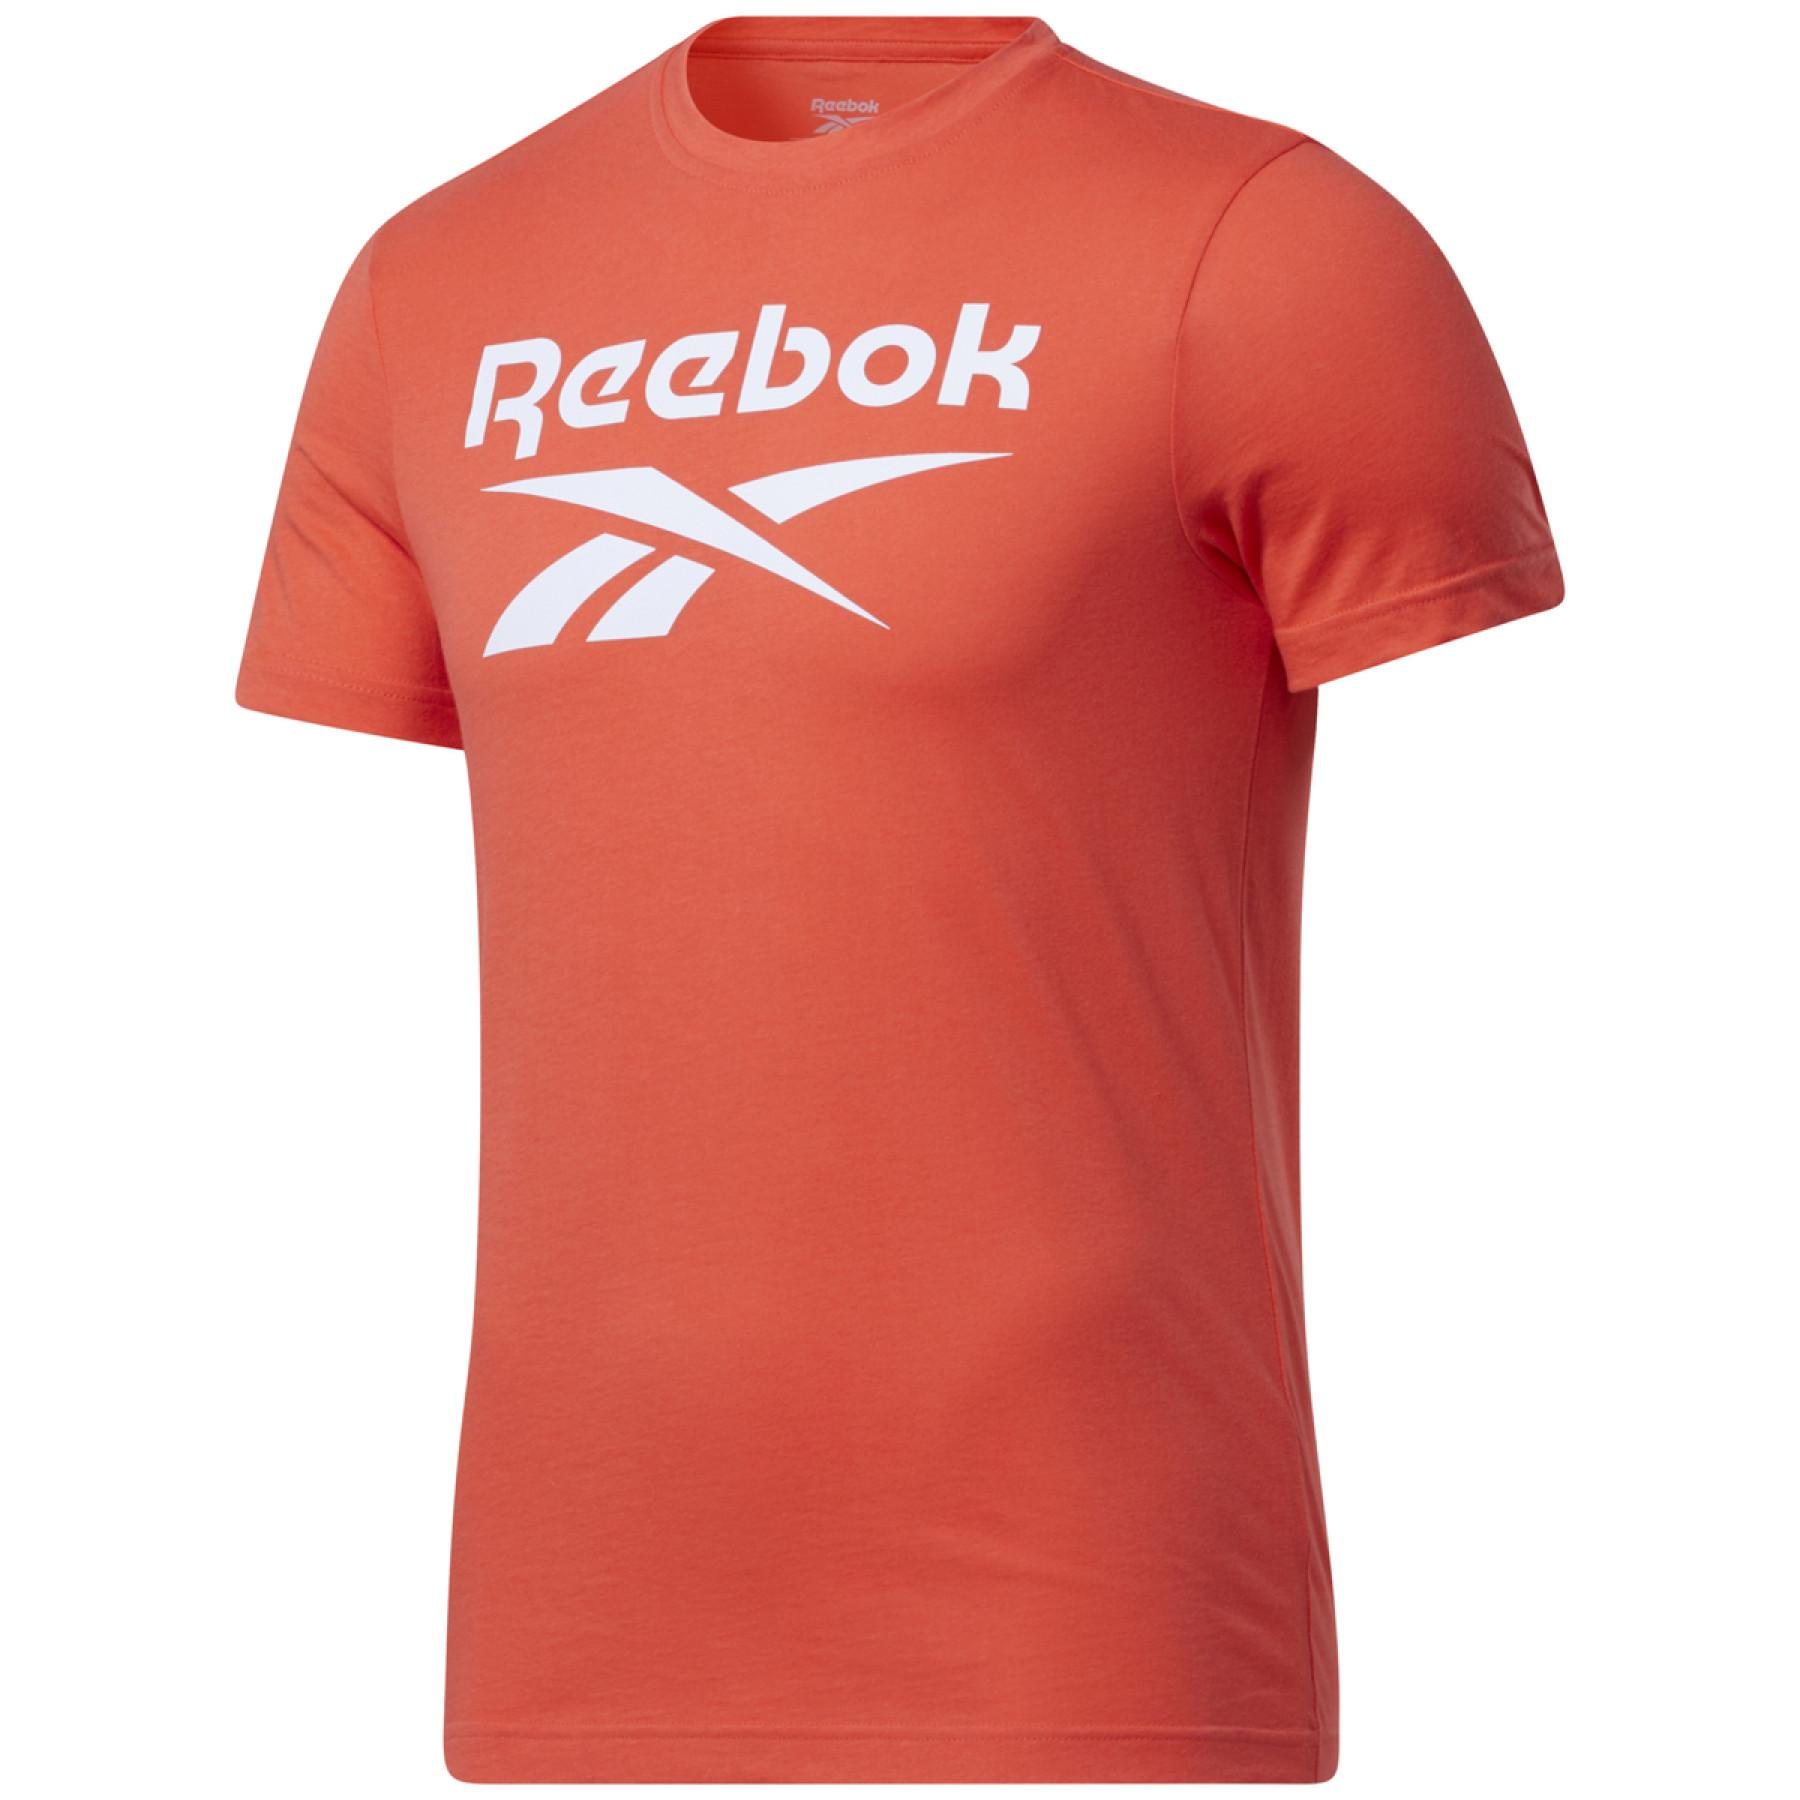 Reebok Graphic Series Stacked T-Shirt